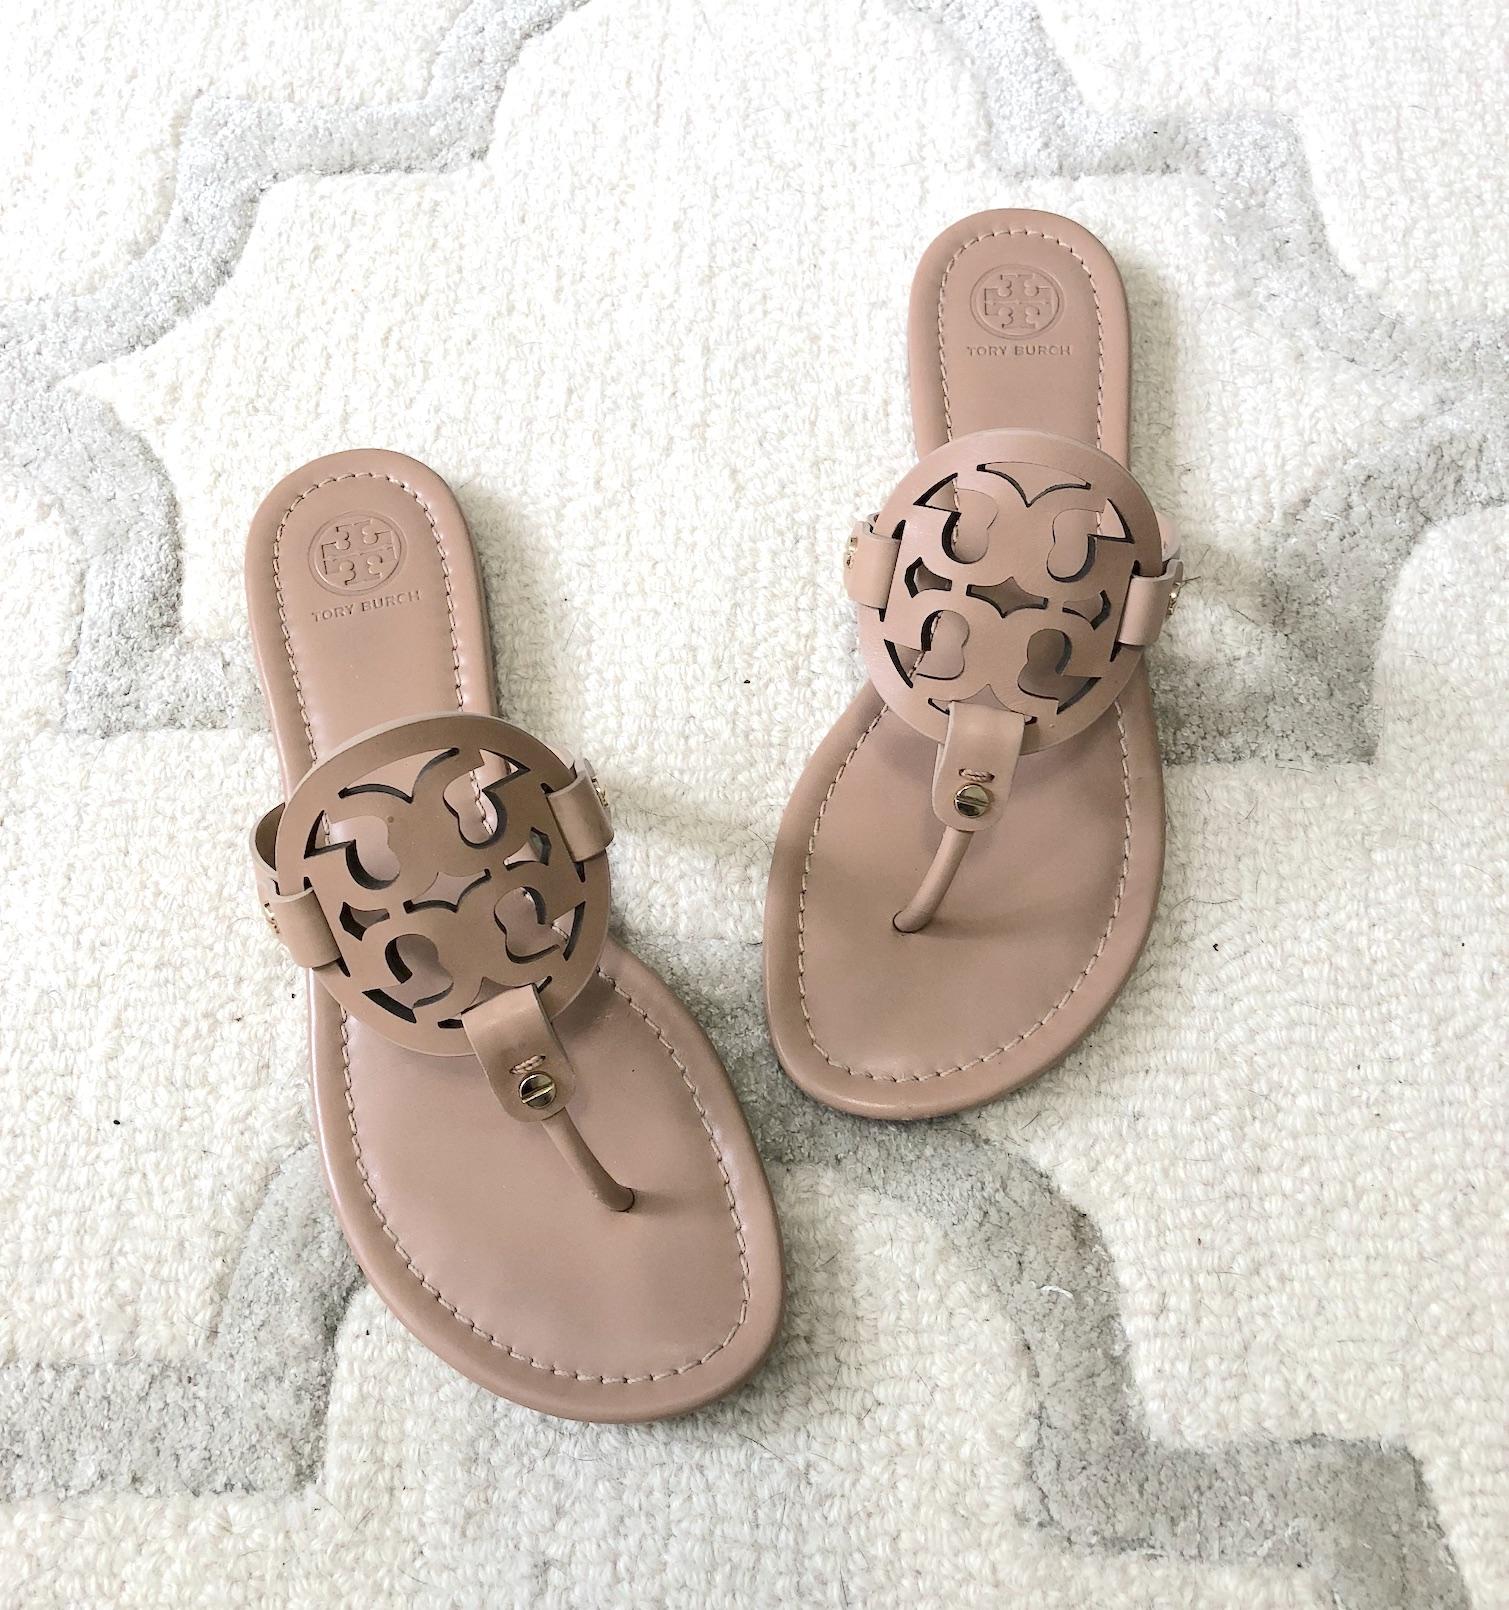 My Favorite Summer Shoes - Tory Burch Miller Sandals